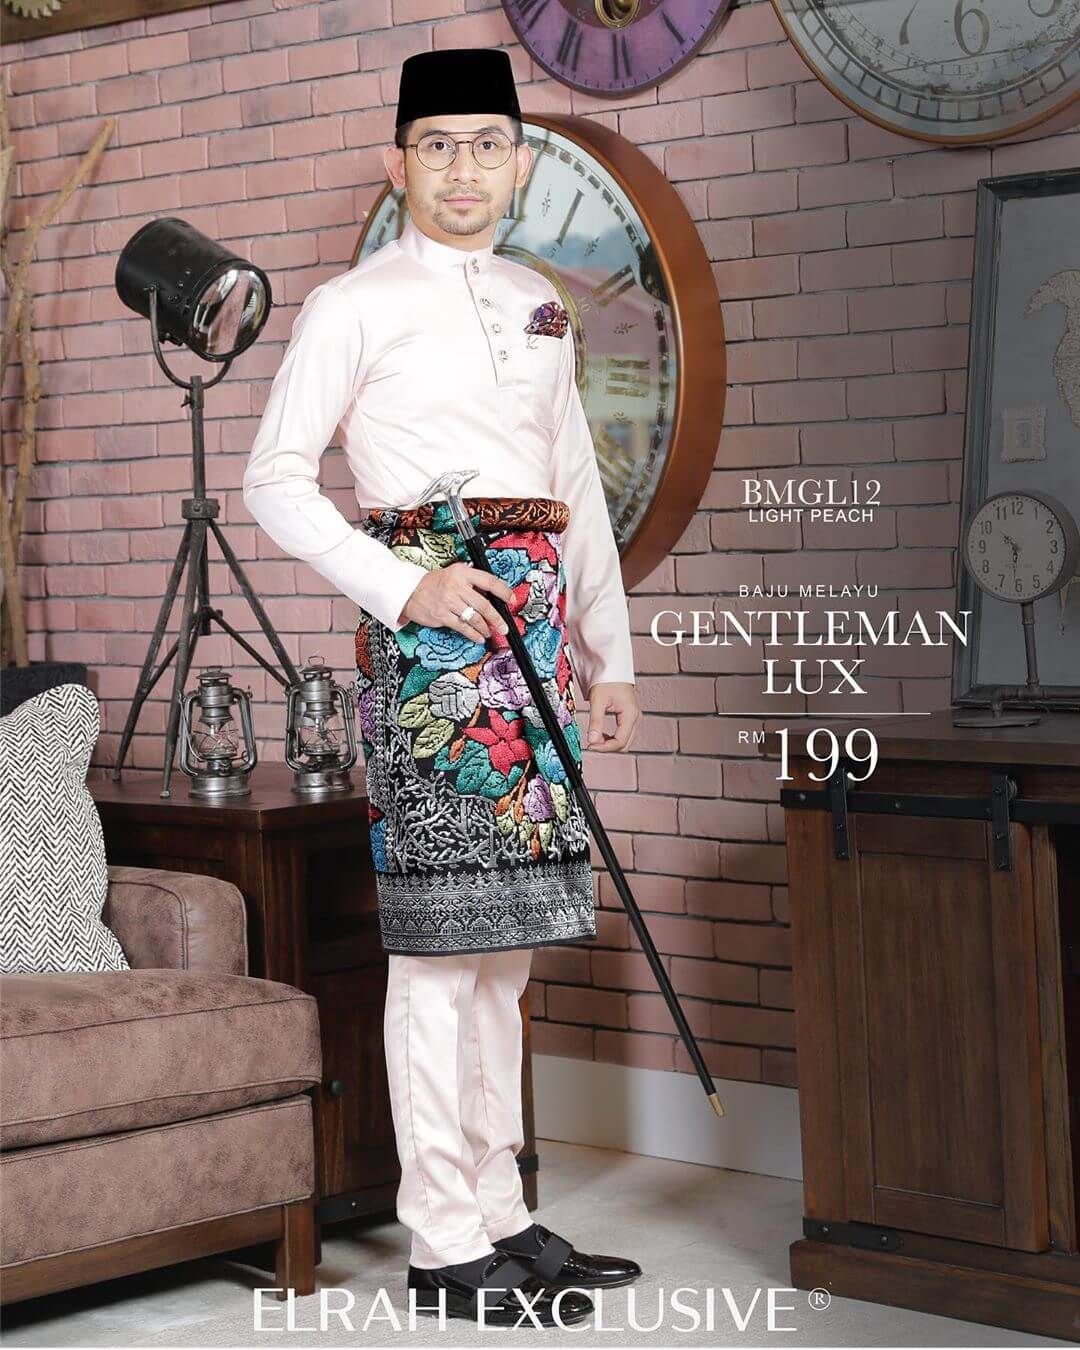 Baju Melayu Gentleman Lux Light Peach